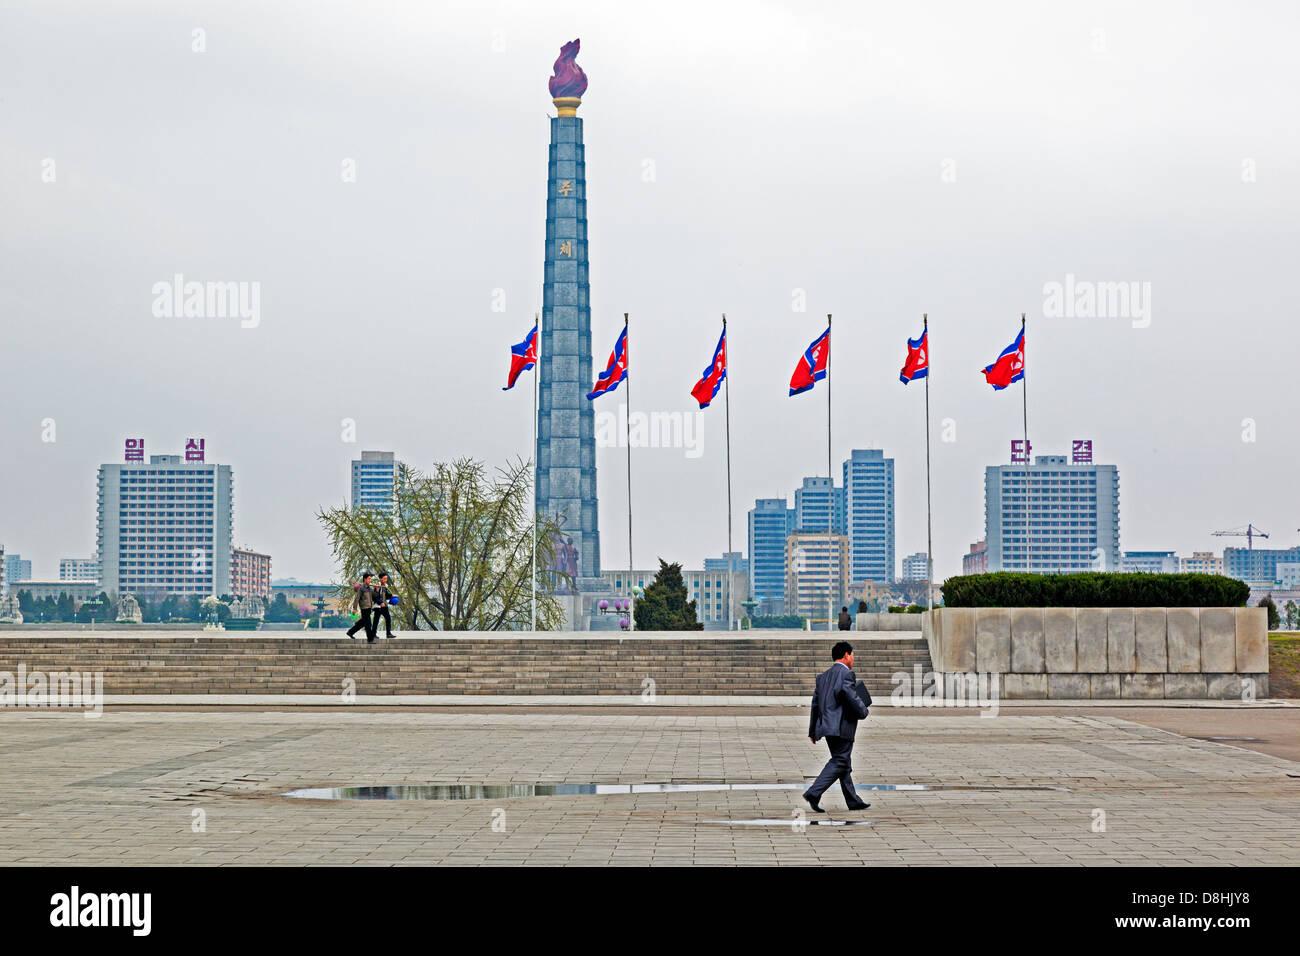 Democratic Peoples's Republic of Korea (DPRK), North Korea, Pyongyang, Juche Tower and the Taedong river - Stock Image